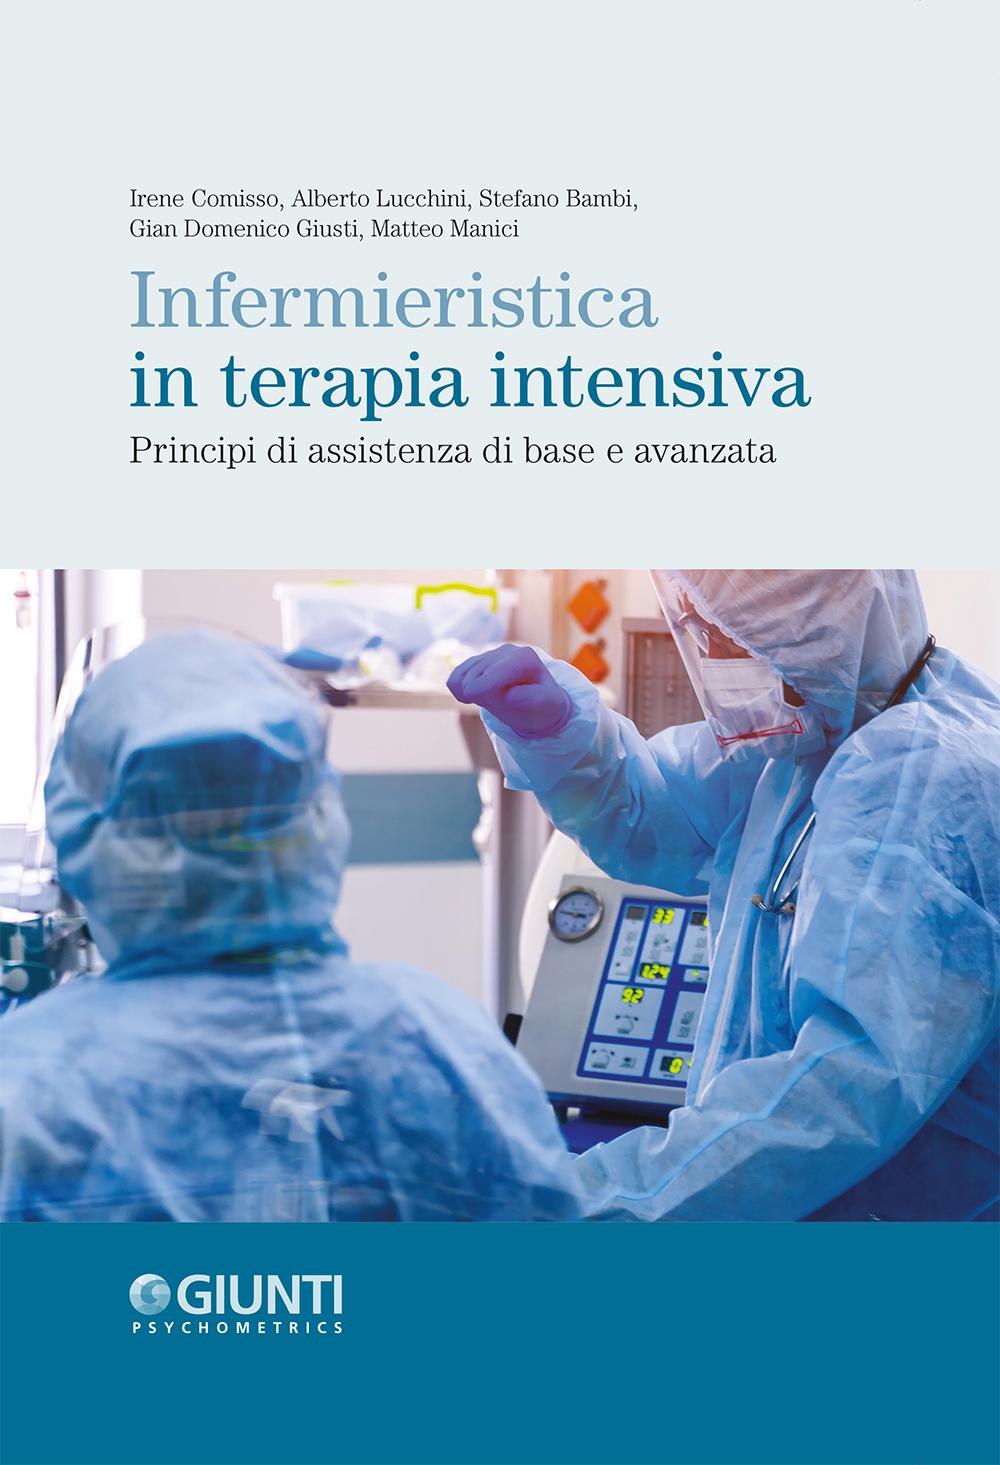 Infermieristica in terapia intensiva